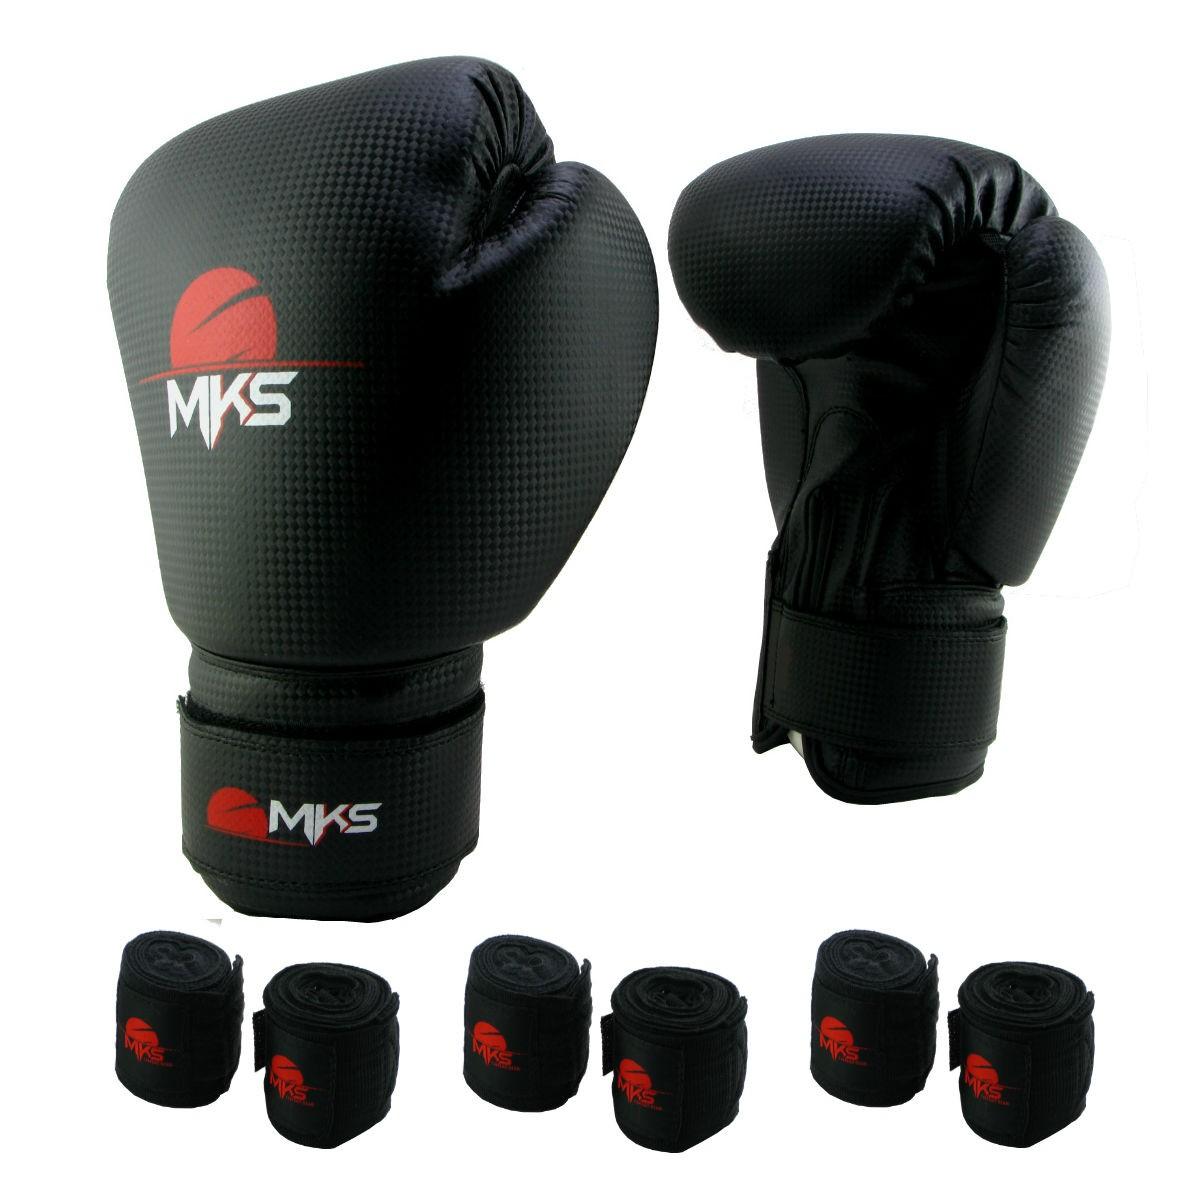 Luva de Boxe Prospect MKS Preta 16 oz +  03 bandagem